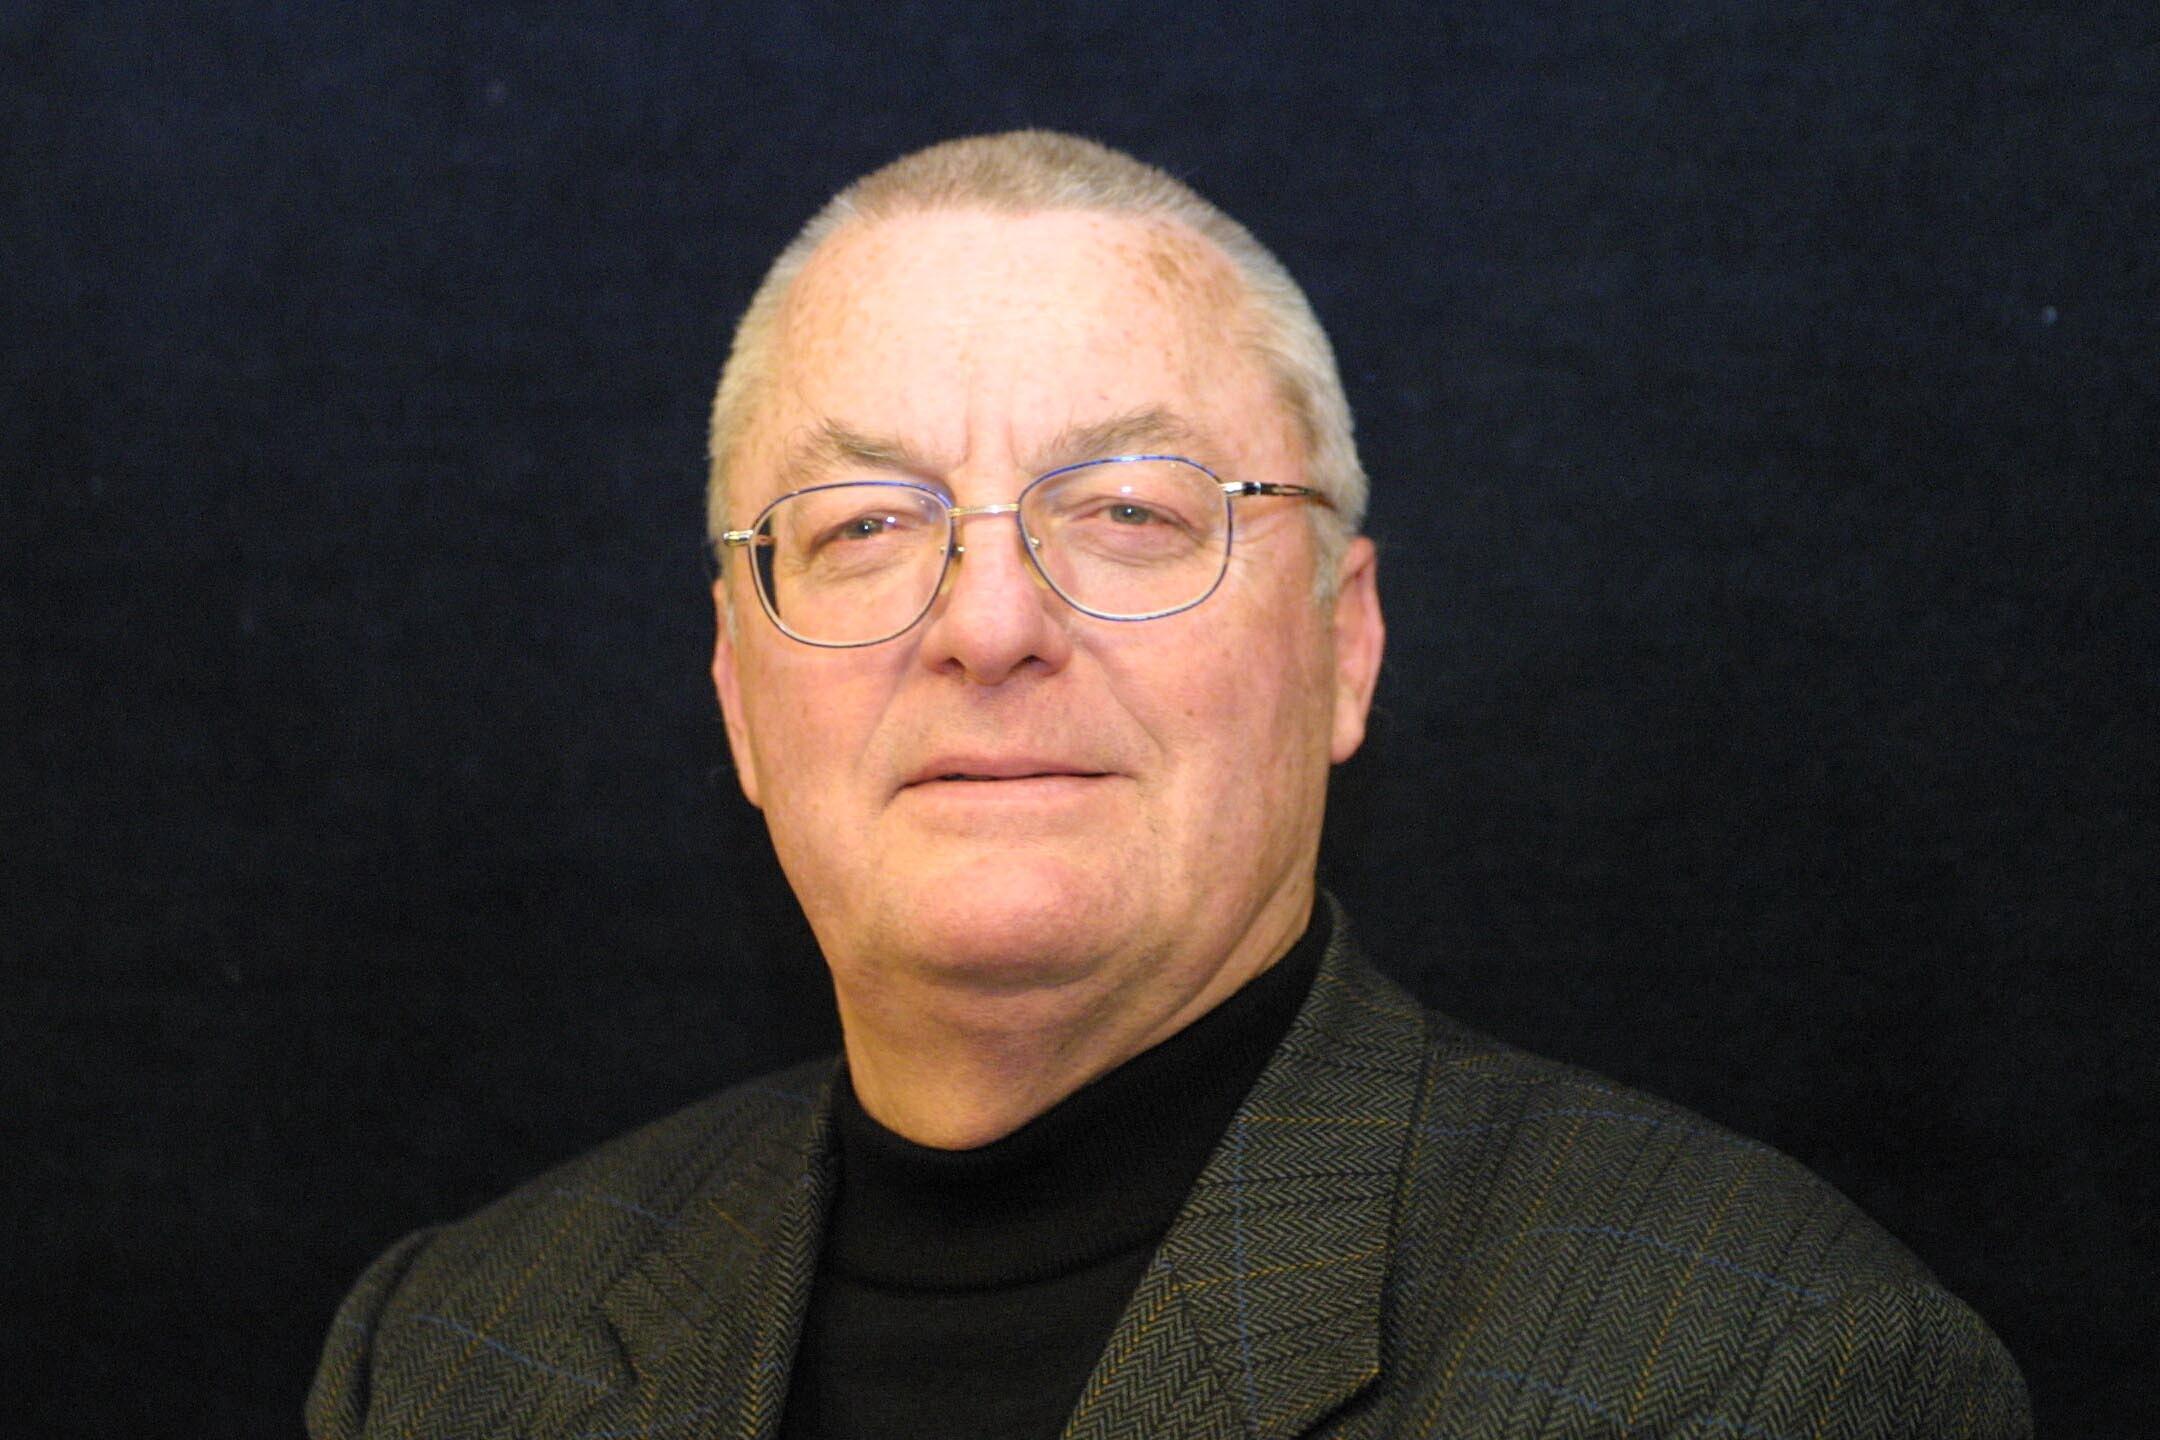 Pierre Vial salary